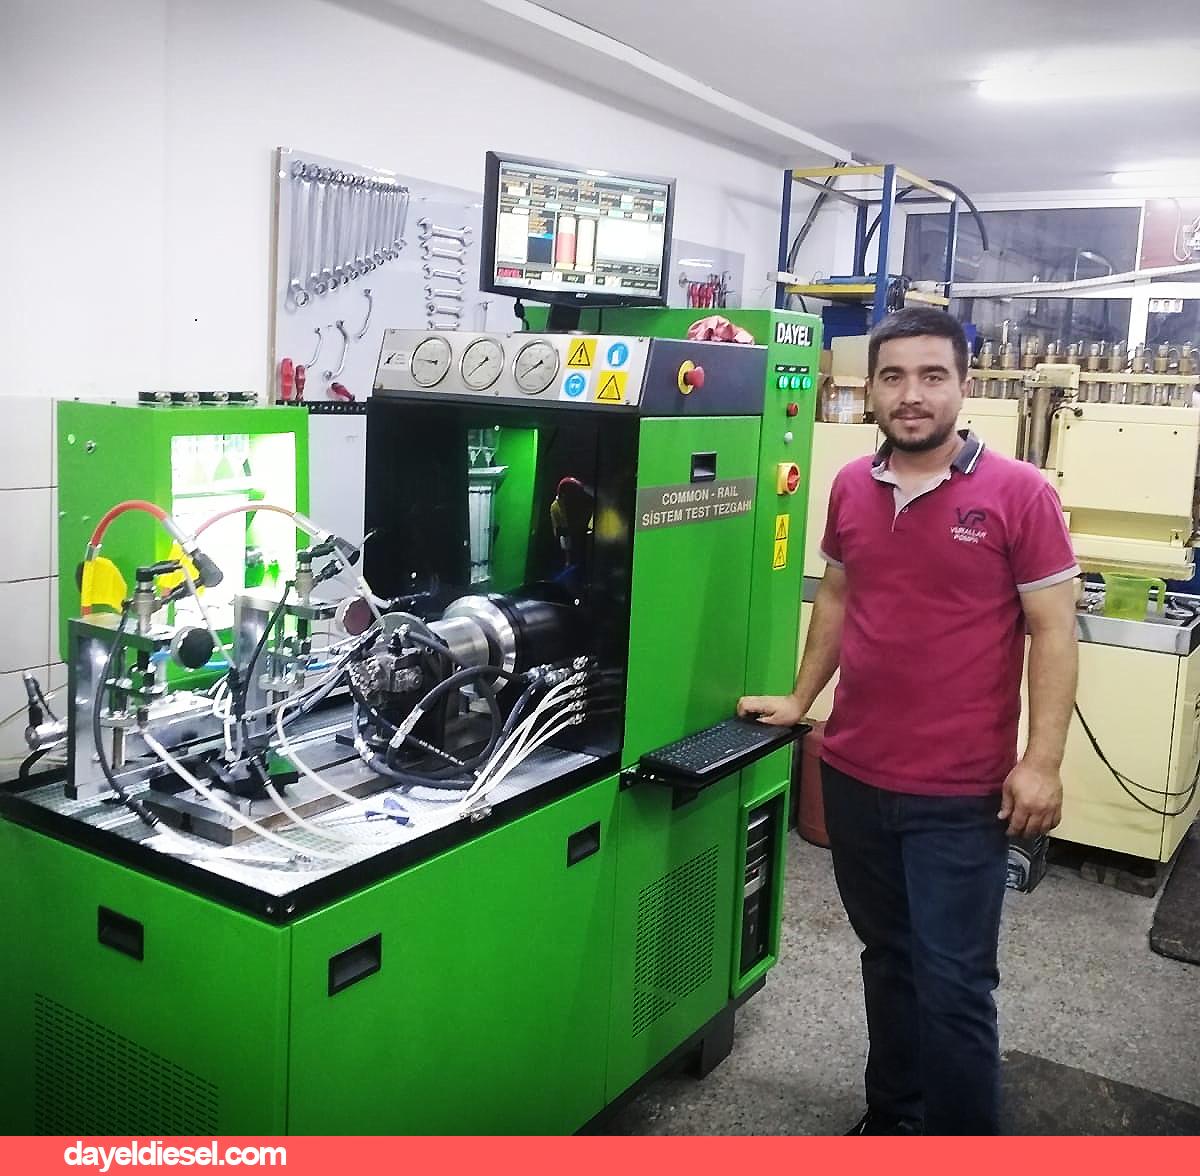 Antalya Vurallar Pompa DAYEL DIESEL Test Makinesi Kurulumu